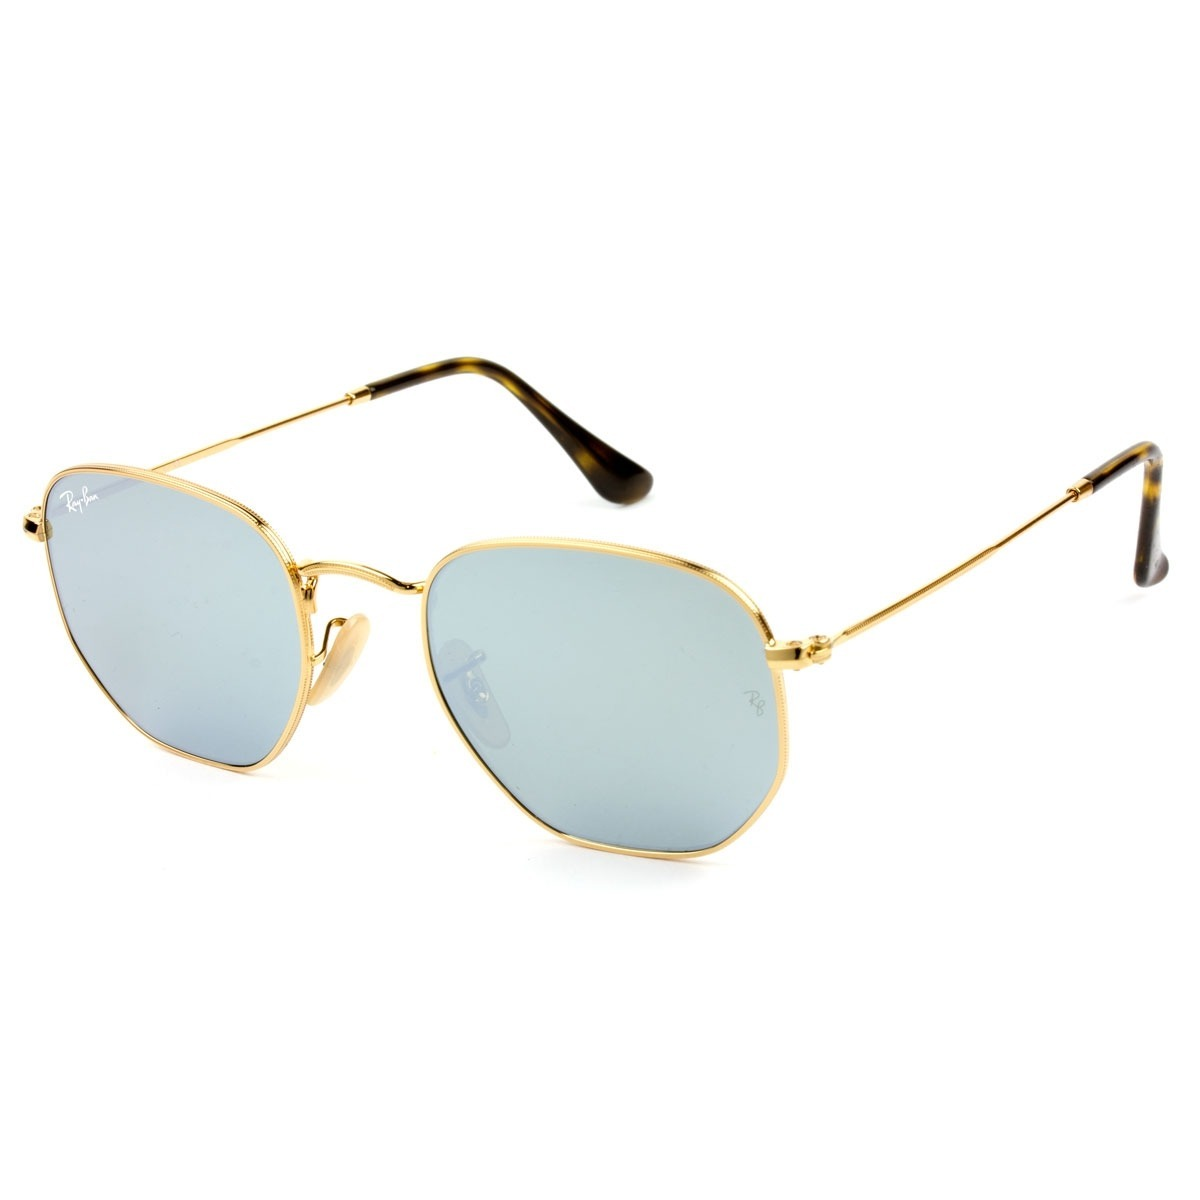 Óculos De Sol Hexagonal Ray Ban Rb 3548n 001 30 Tam 51 - R  417,00 ... 7bb59ea35e